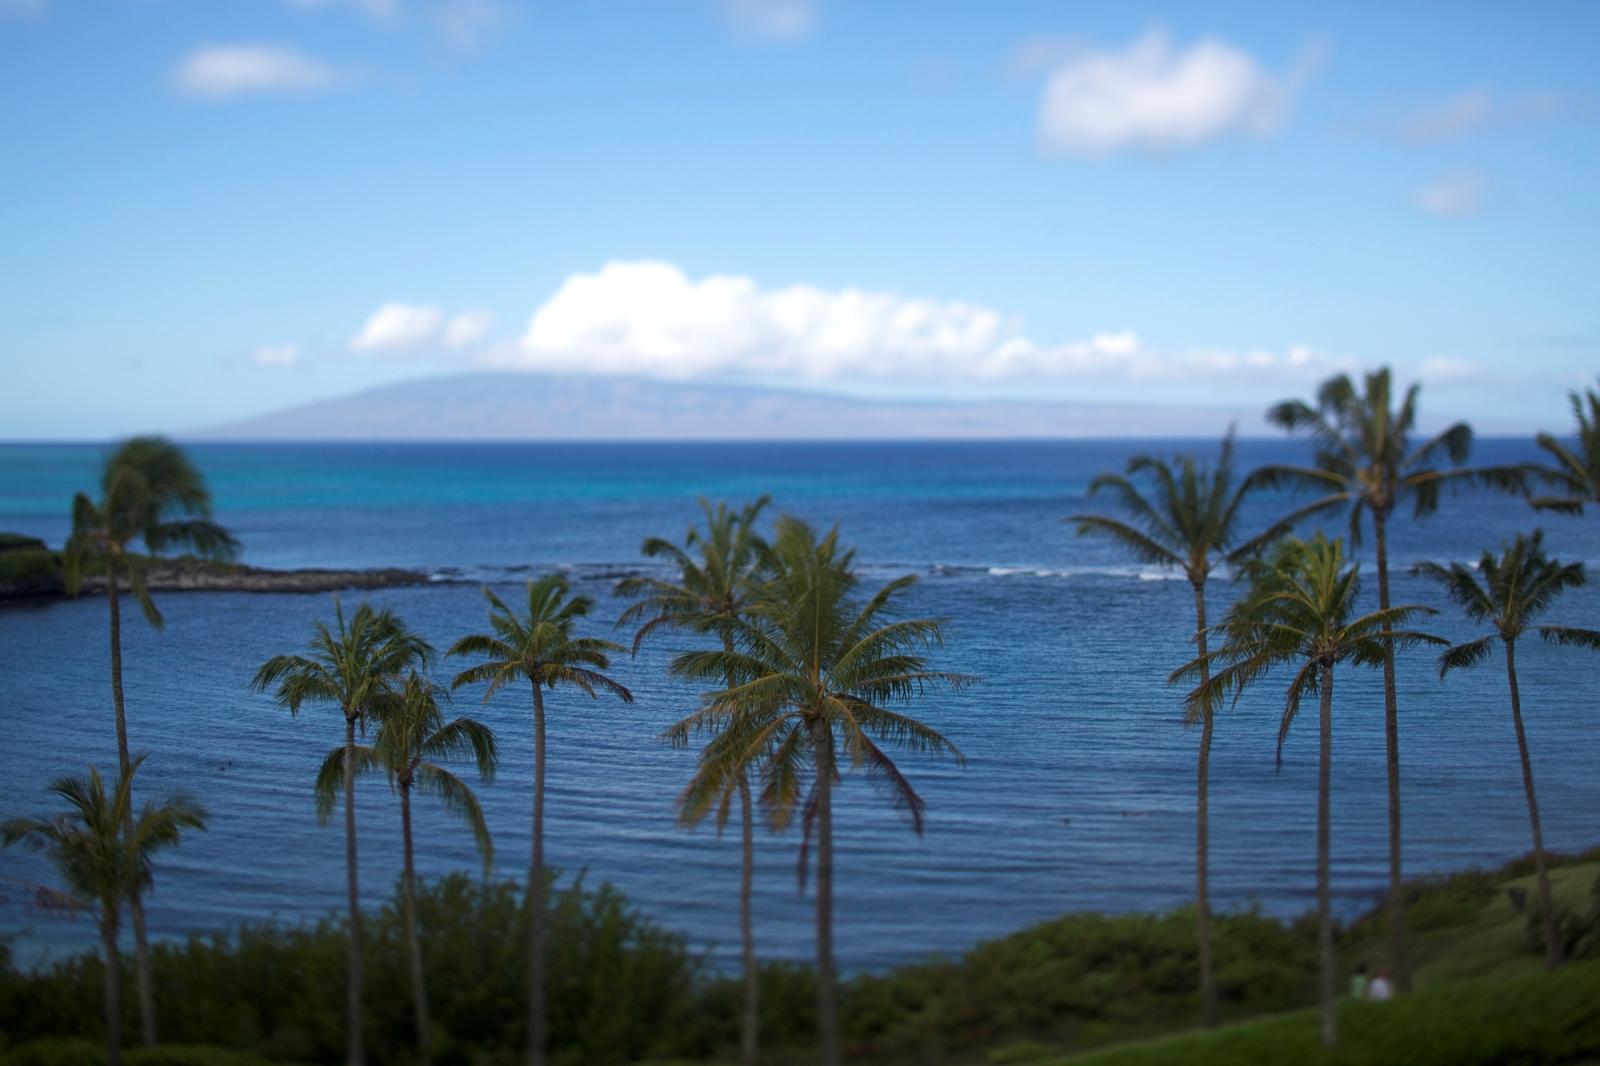 Hawaii Tourism Authority (HTA) / Max Wanger